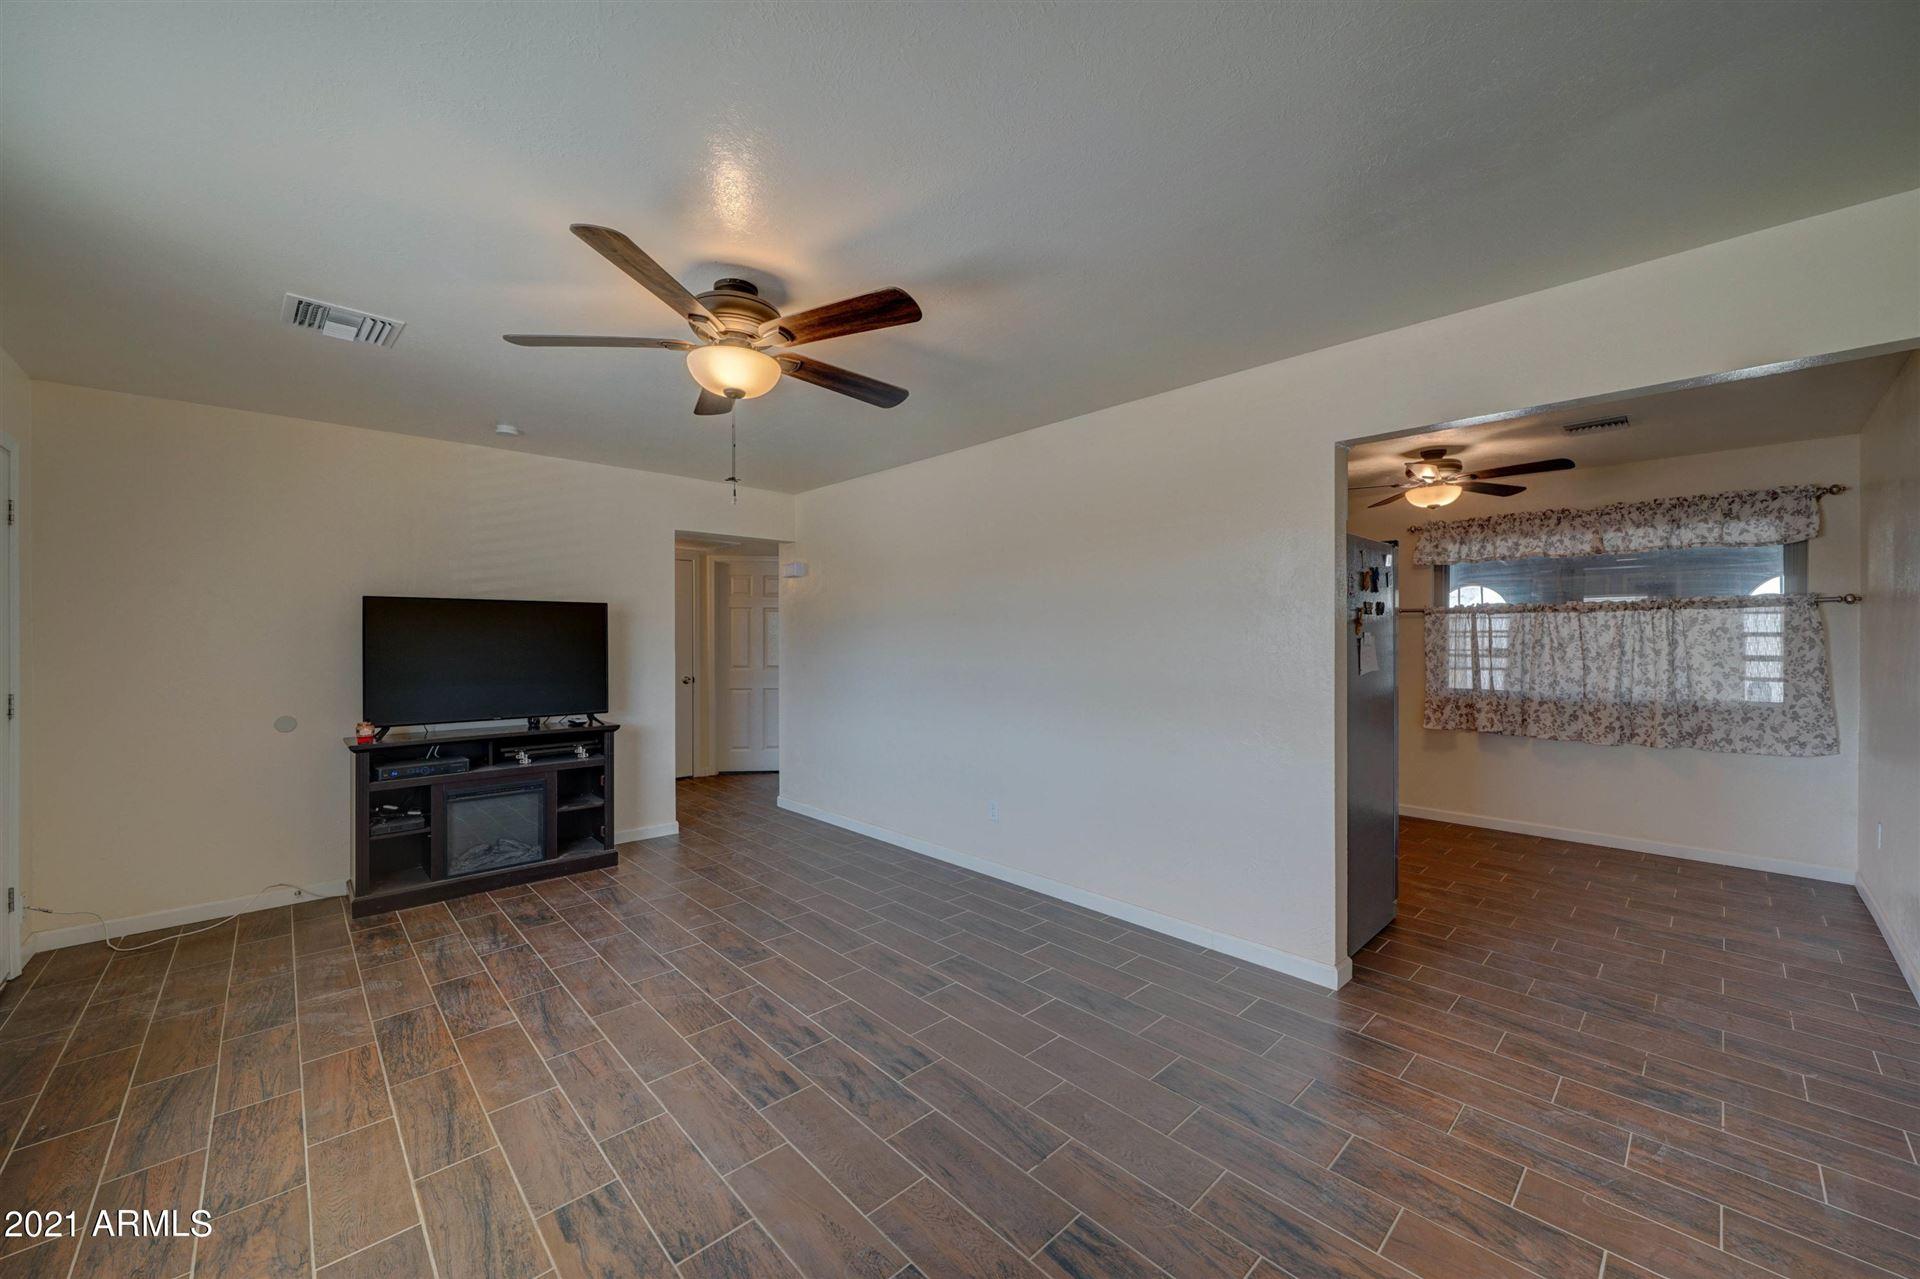 Photo of 856 E FRIAR Avenue, Apache Junction, AZ 85119 (MLS # 6201839)